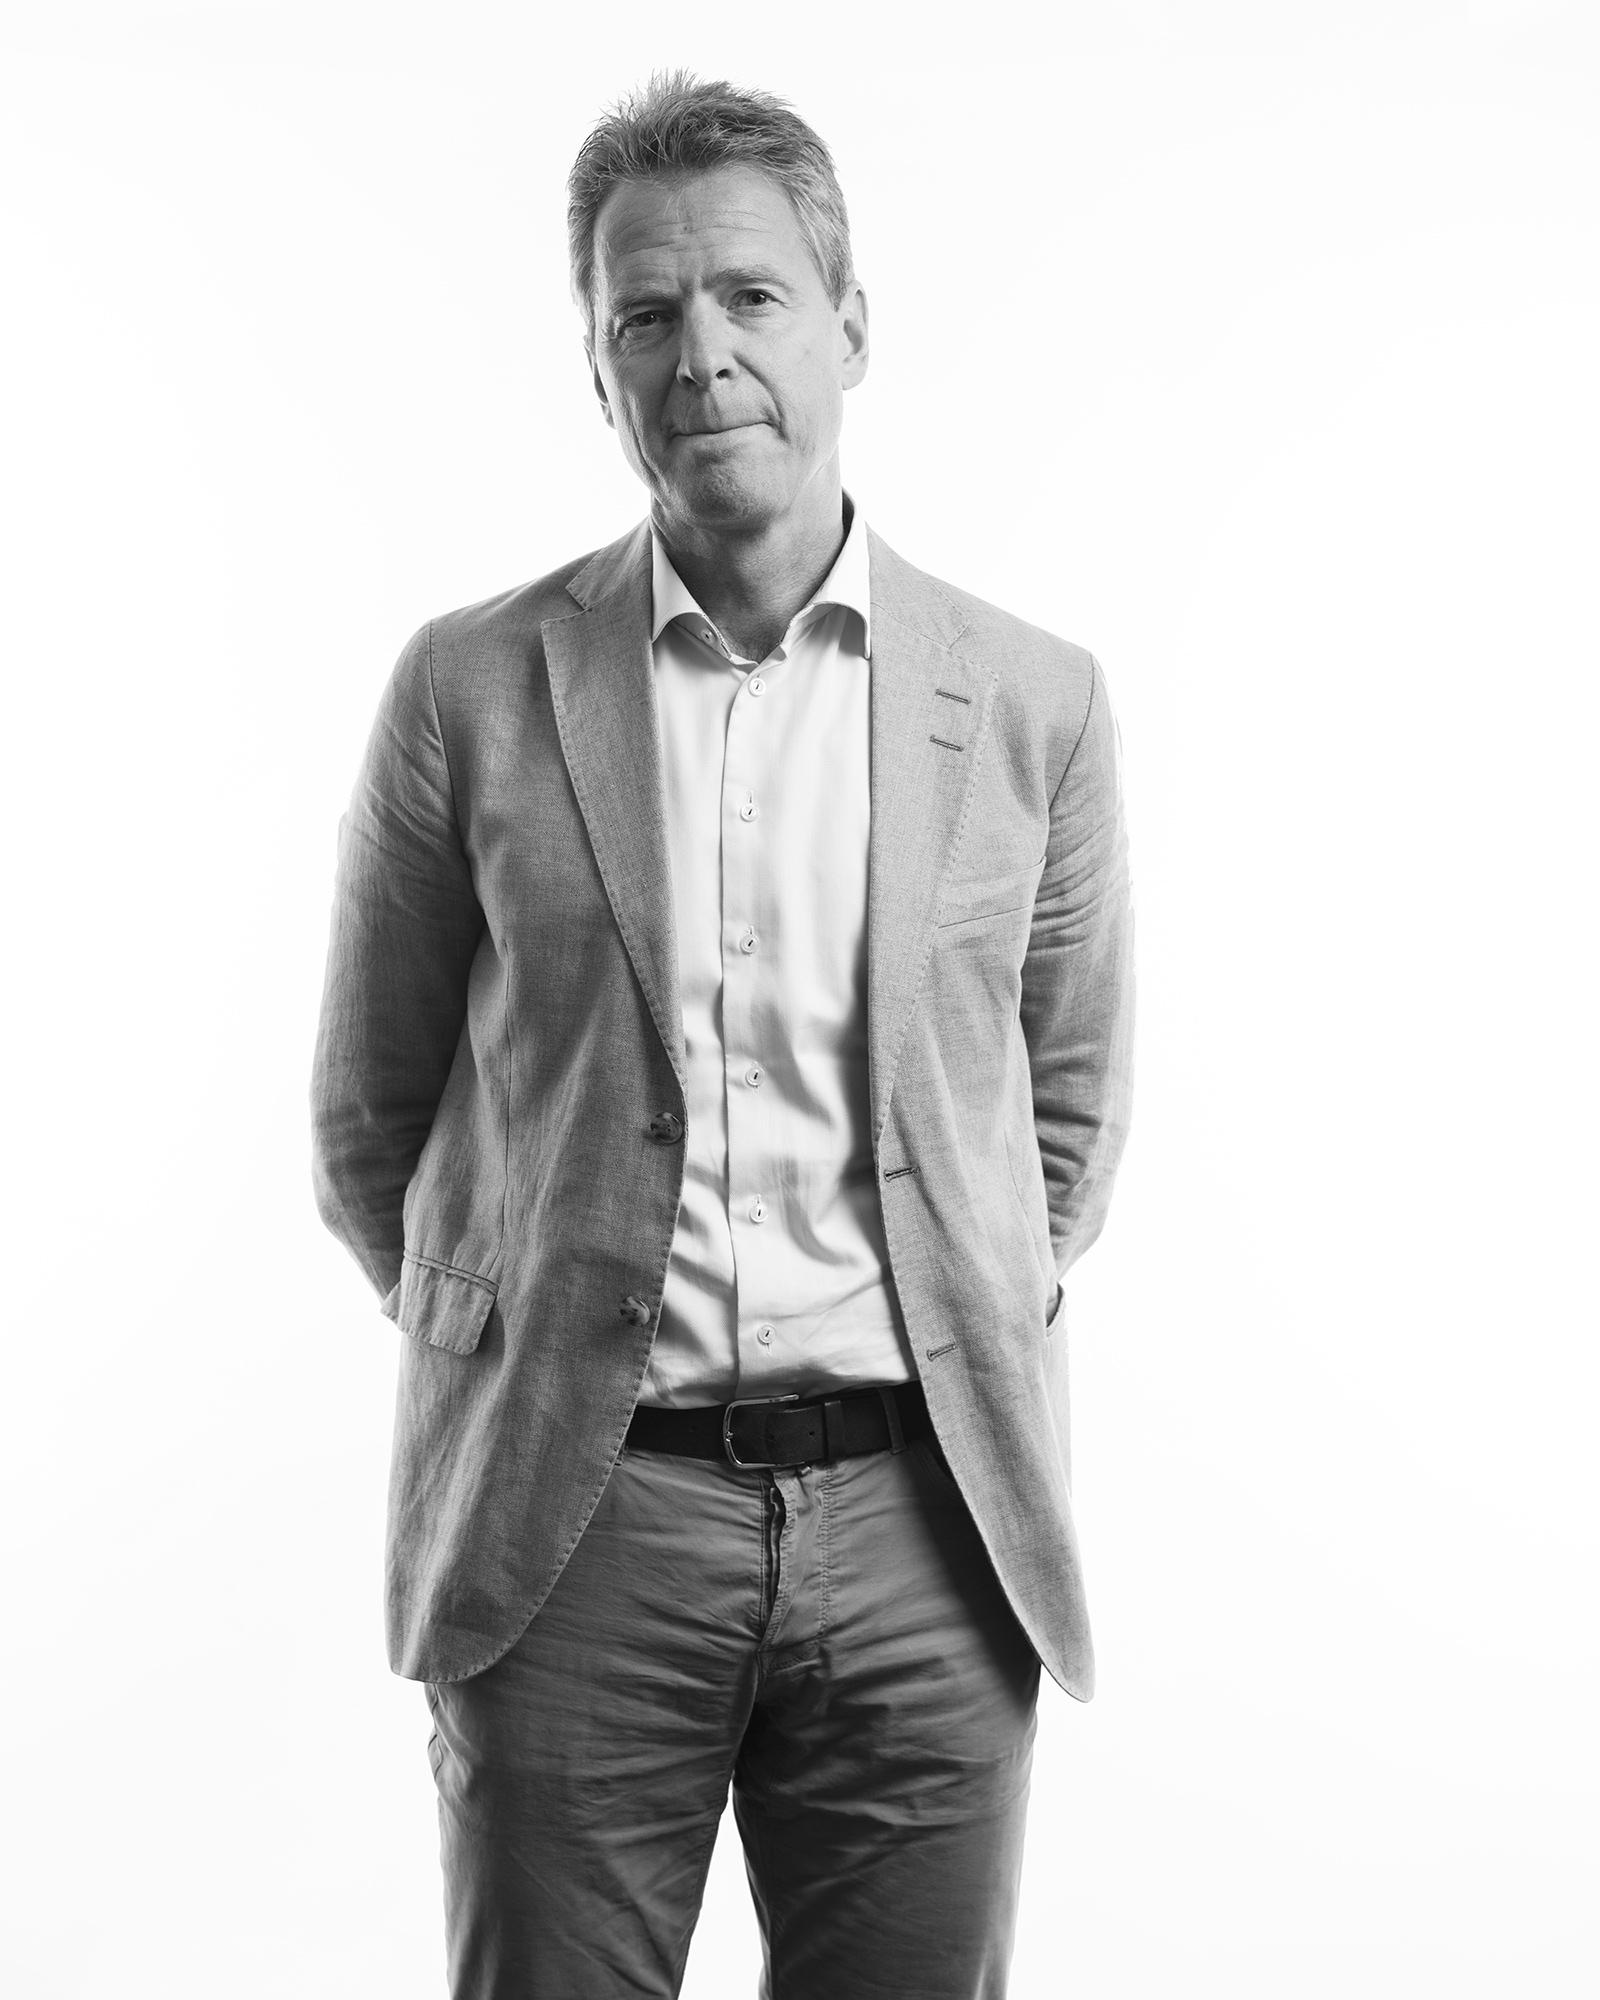 Jens Johan Hjort Chairman, Arctic Arts Festival (c) Knut Åserud/Arctic Arts Festival